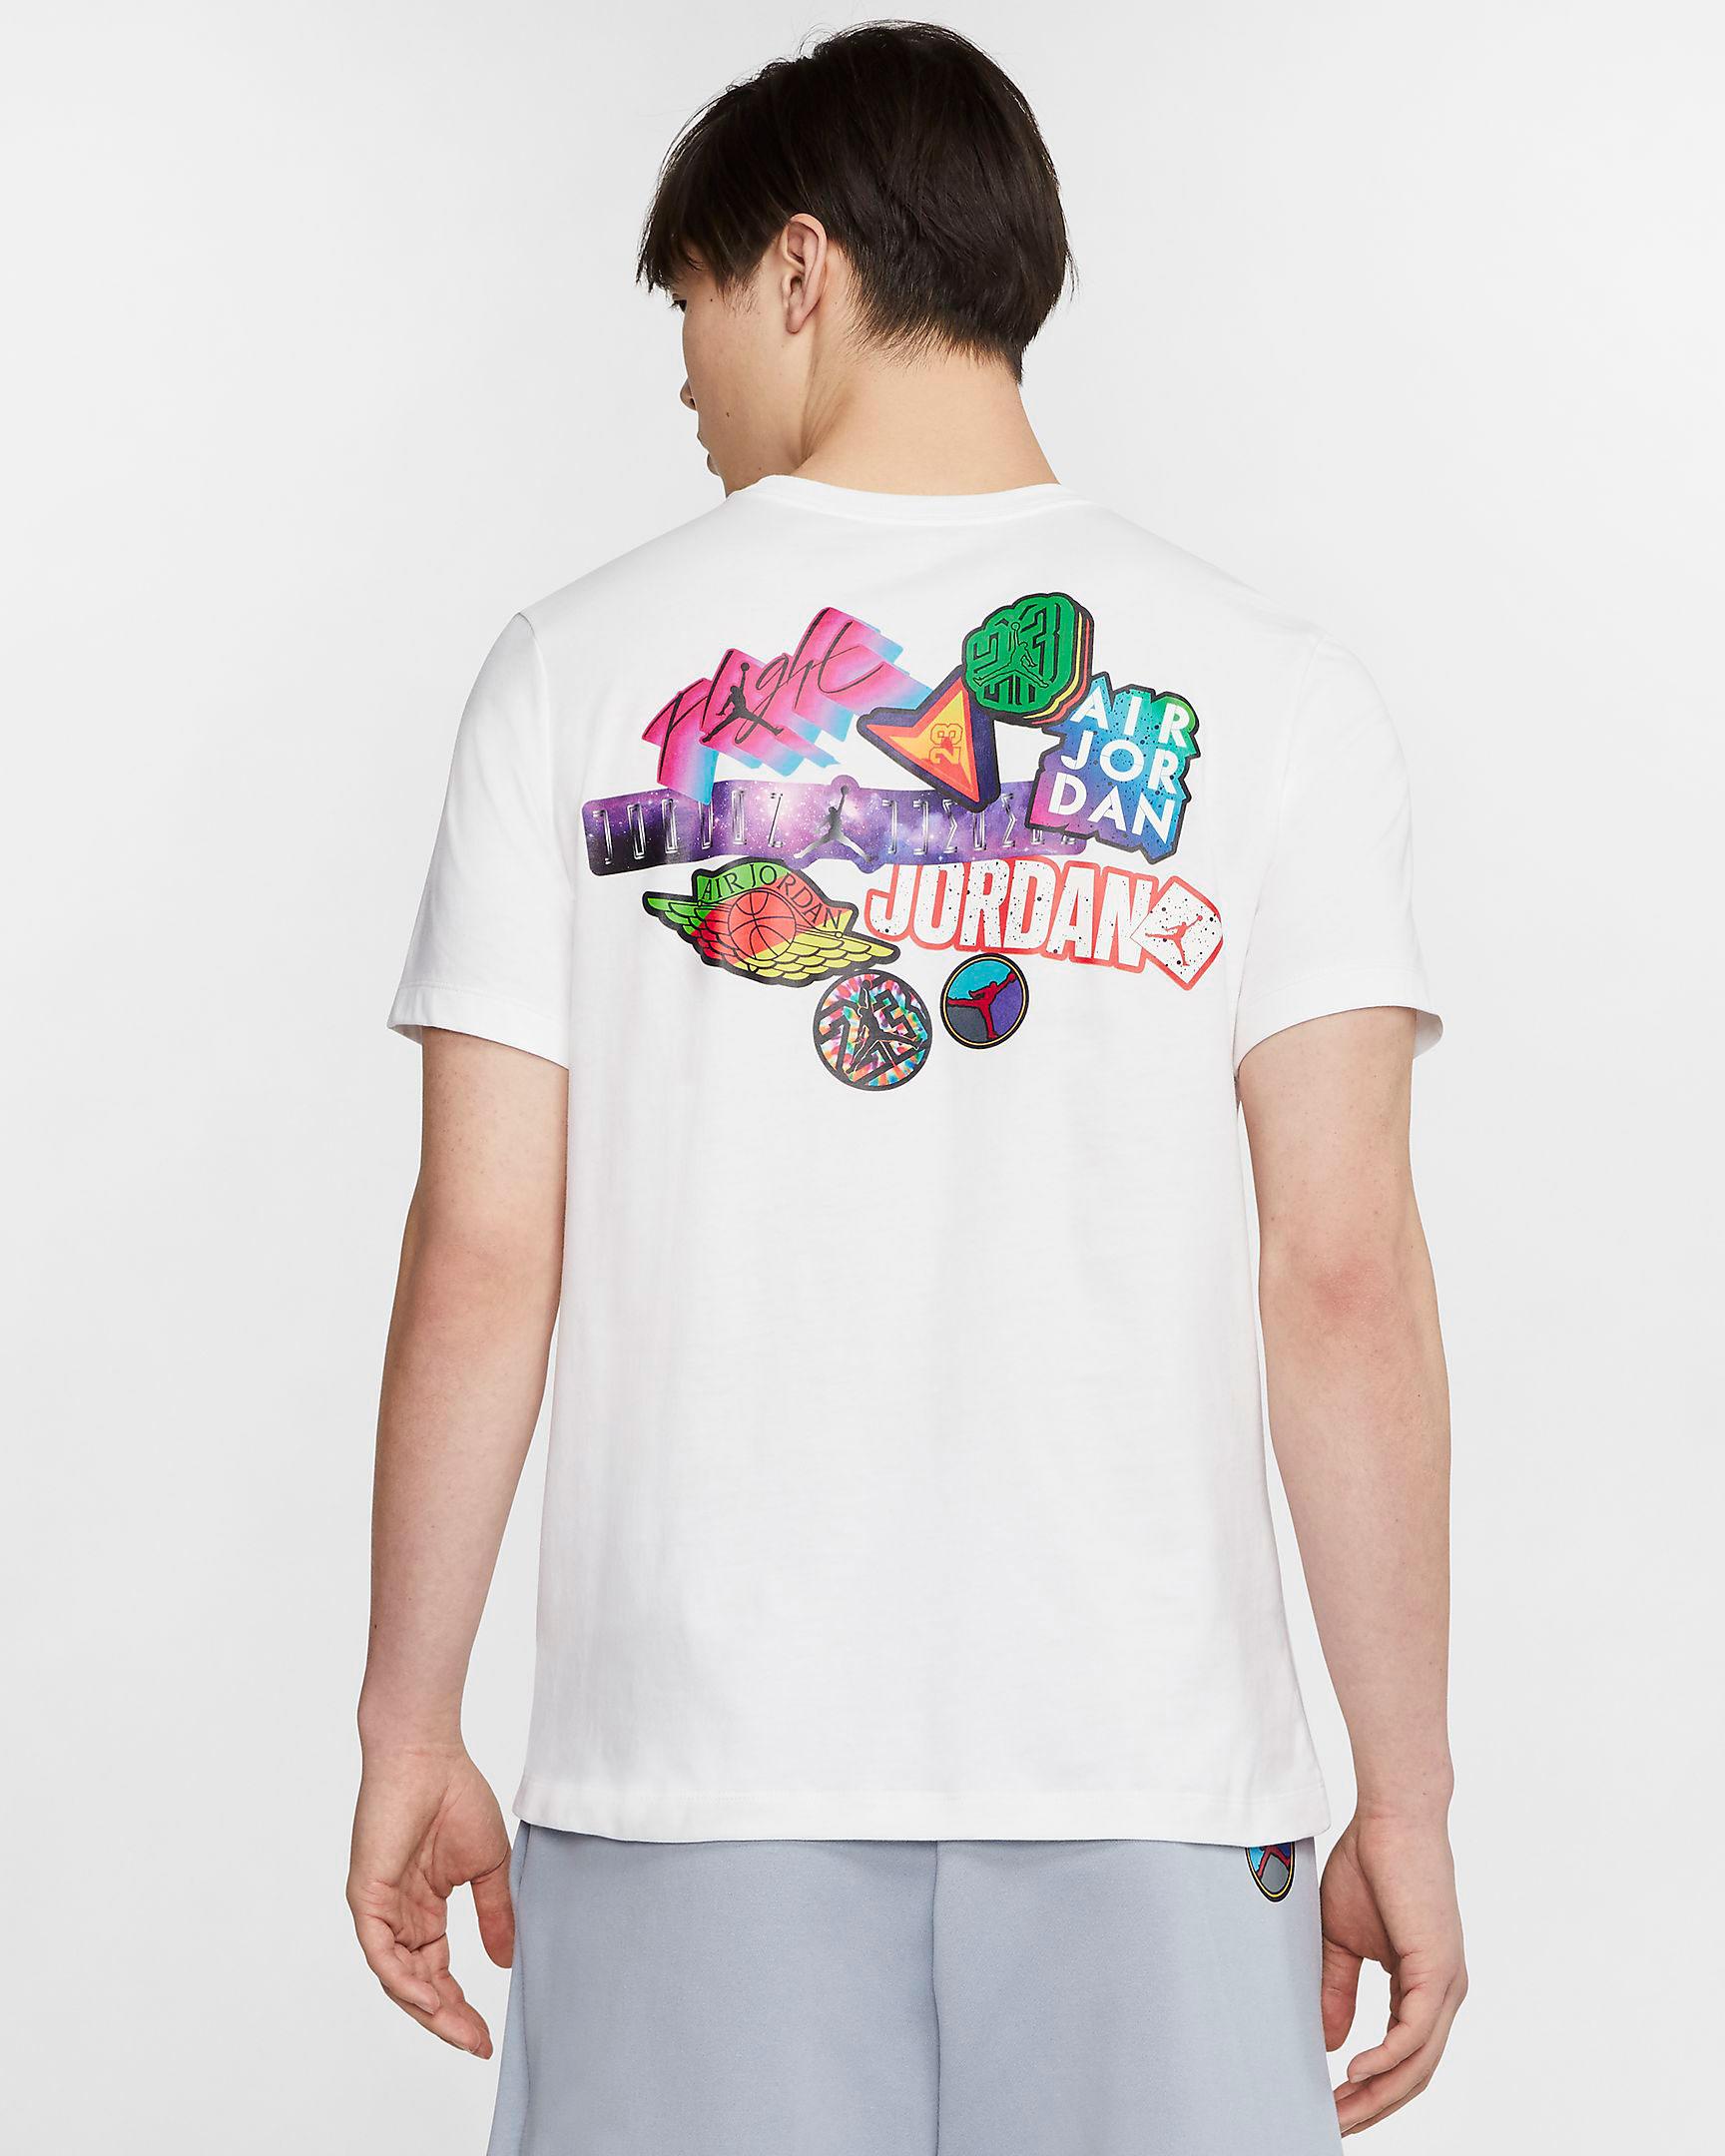 jordan-5-alternate-bel-air-matching-t-shirt-2